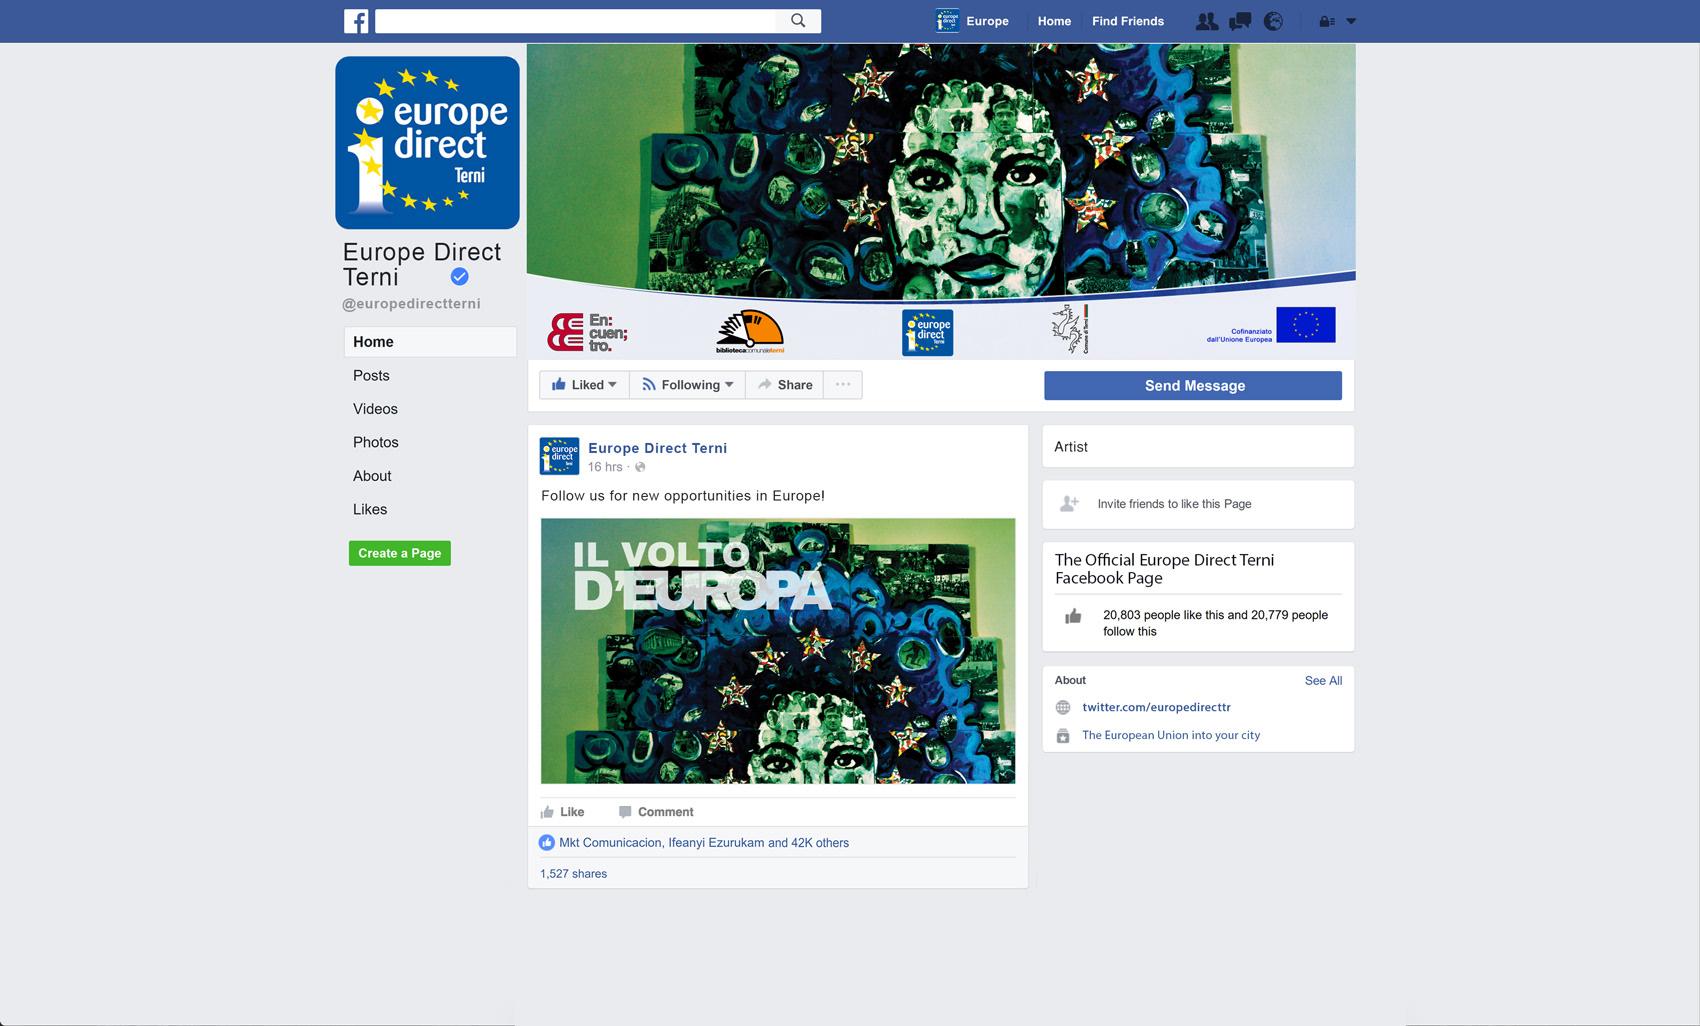 pagina facebook Europe Direct Terni